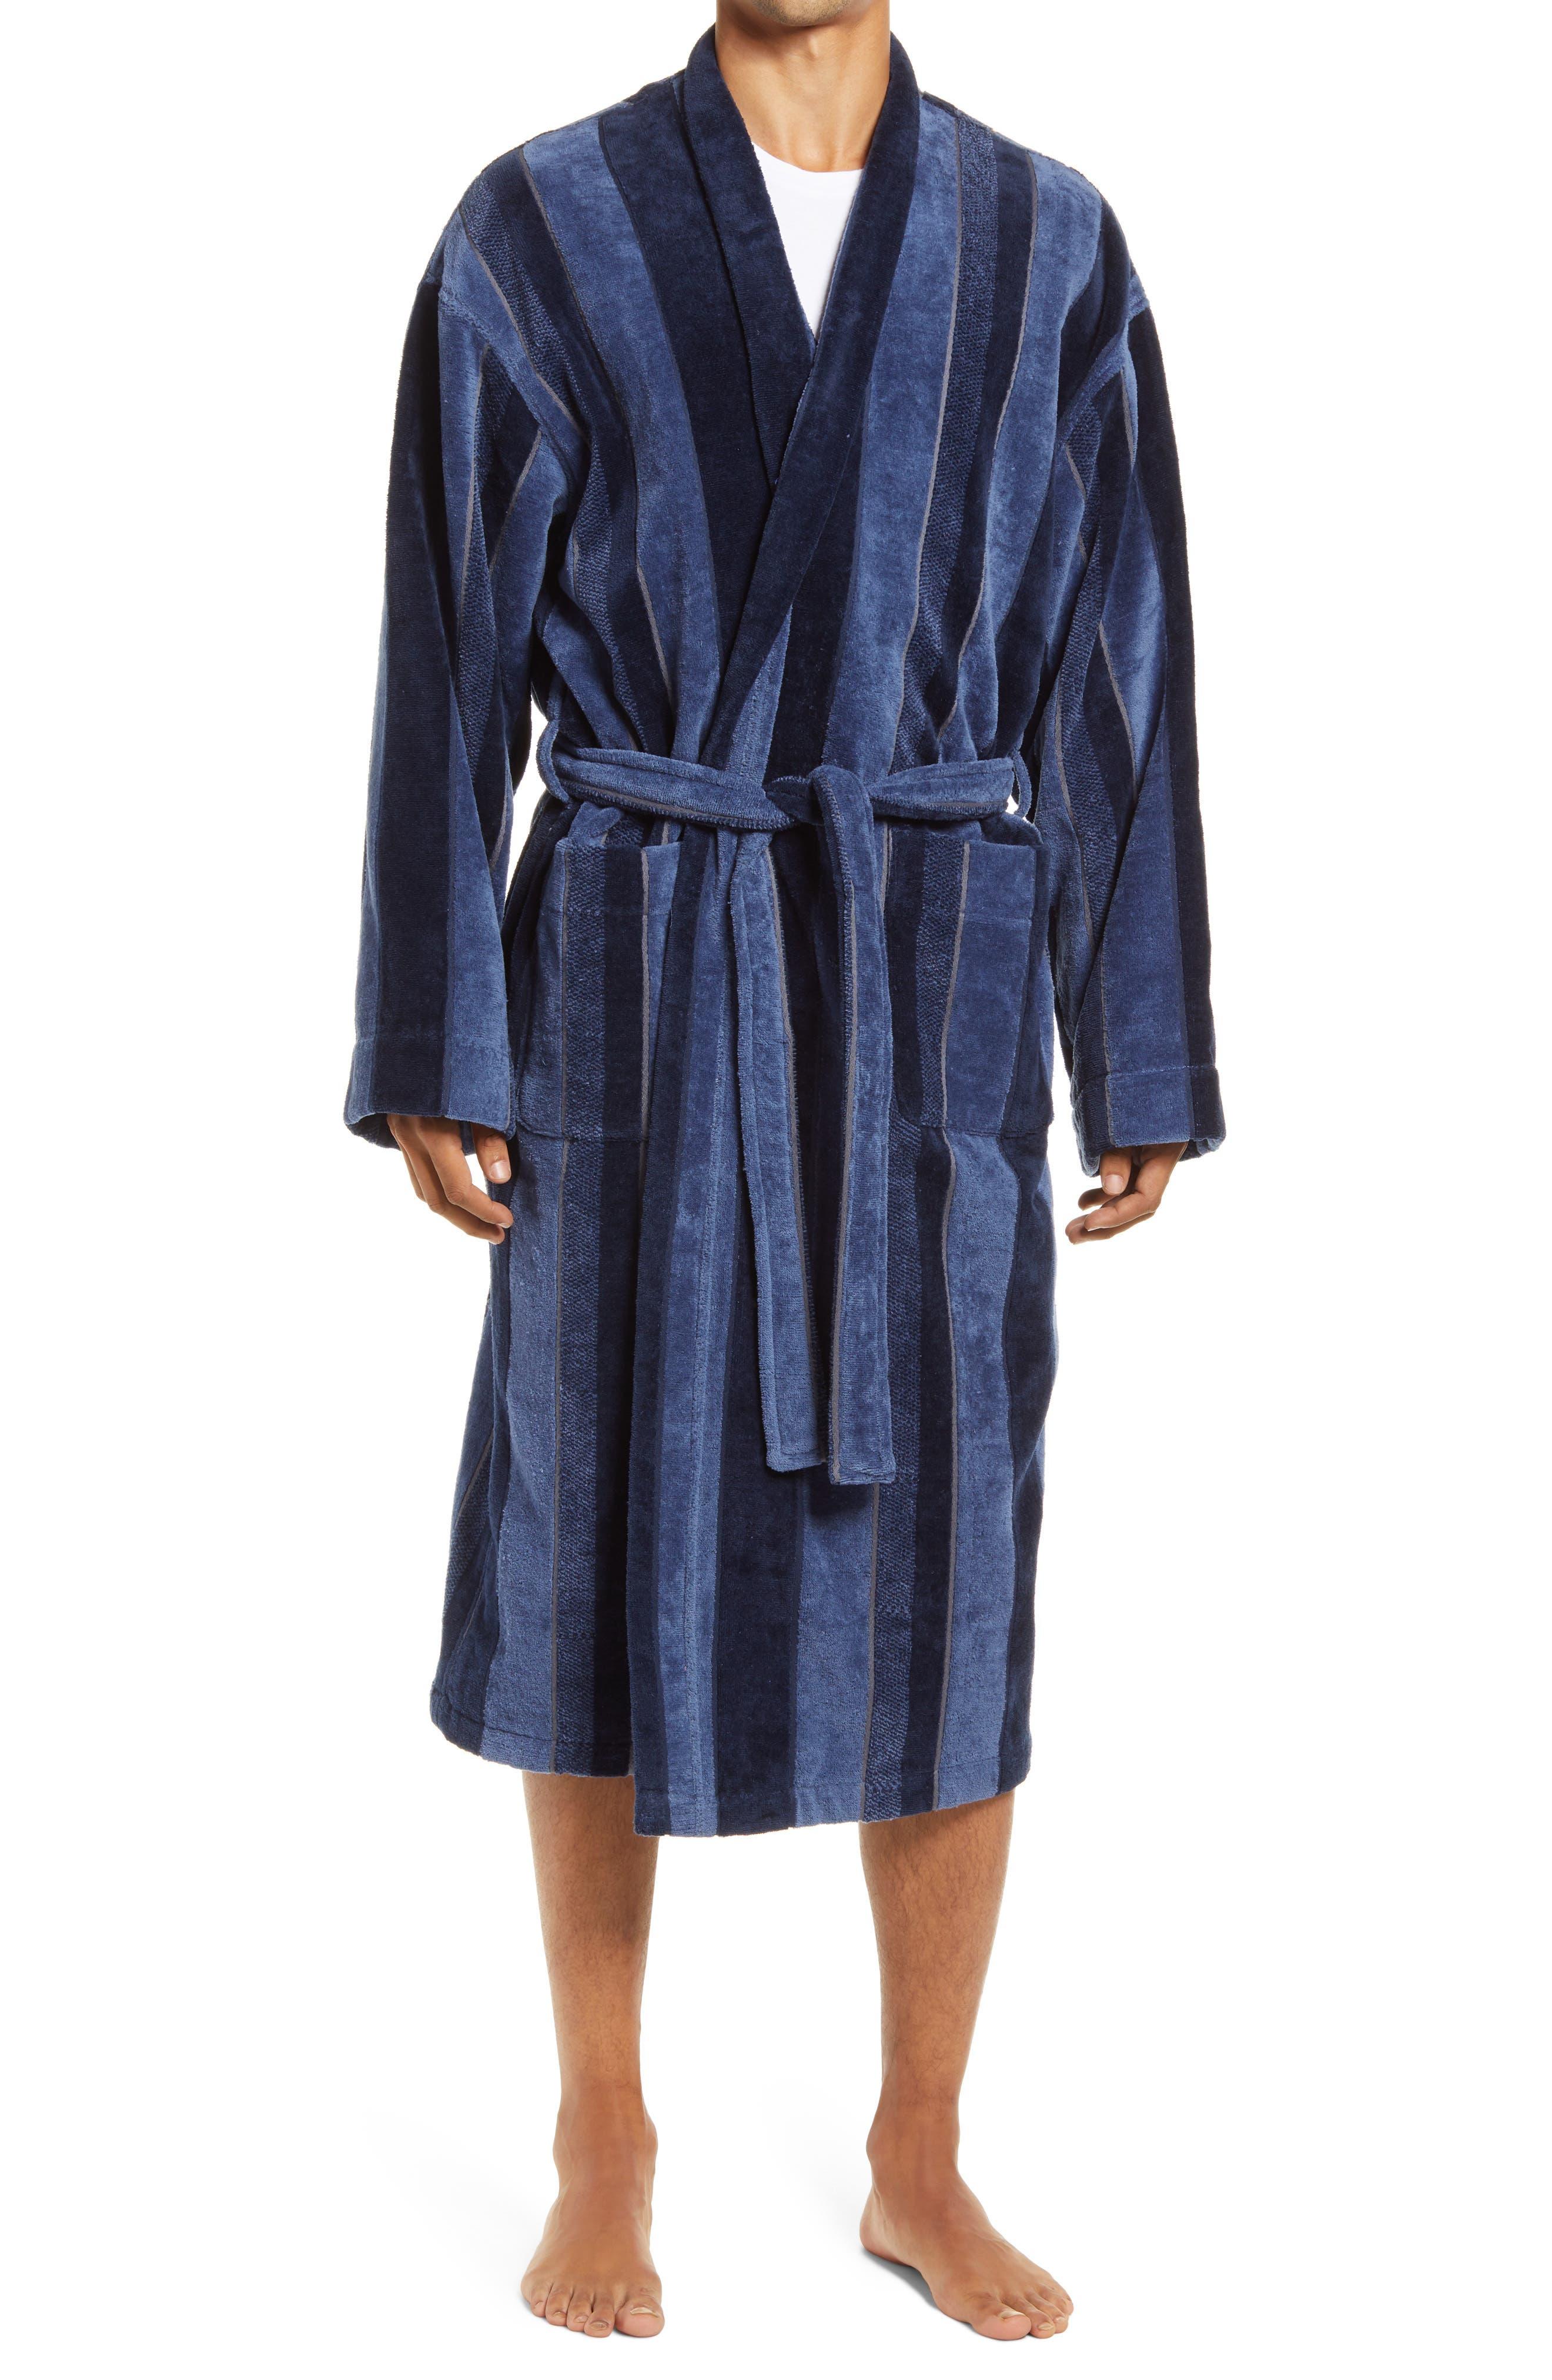 1940s Men's Underwear: Briefs, Boxers, Unions, & Socks Mens Majestic International Twilight Terry Velour Robe $110.00 AT vintagedancer.com